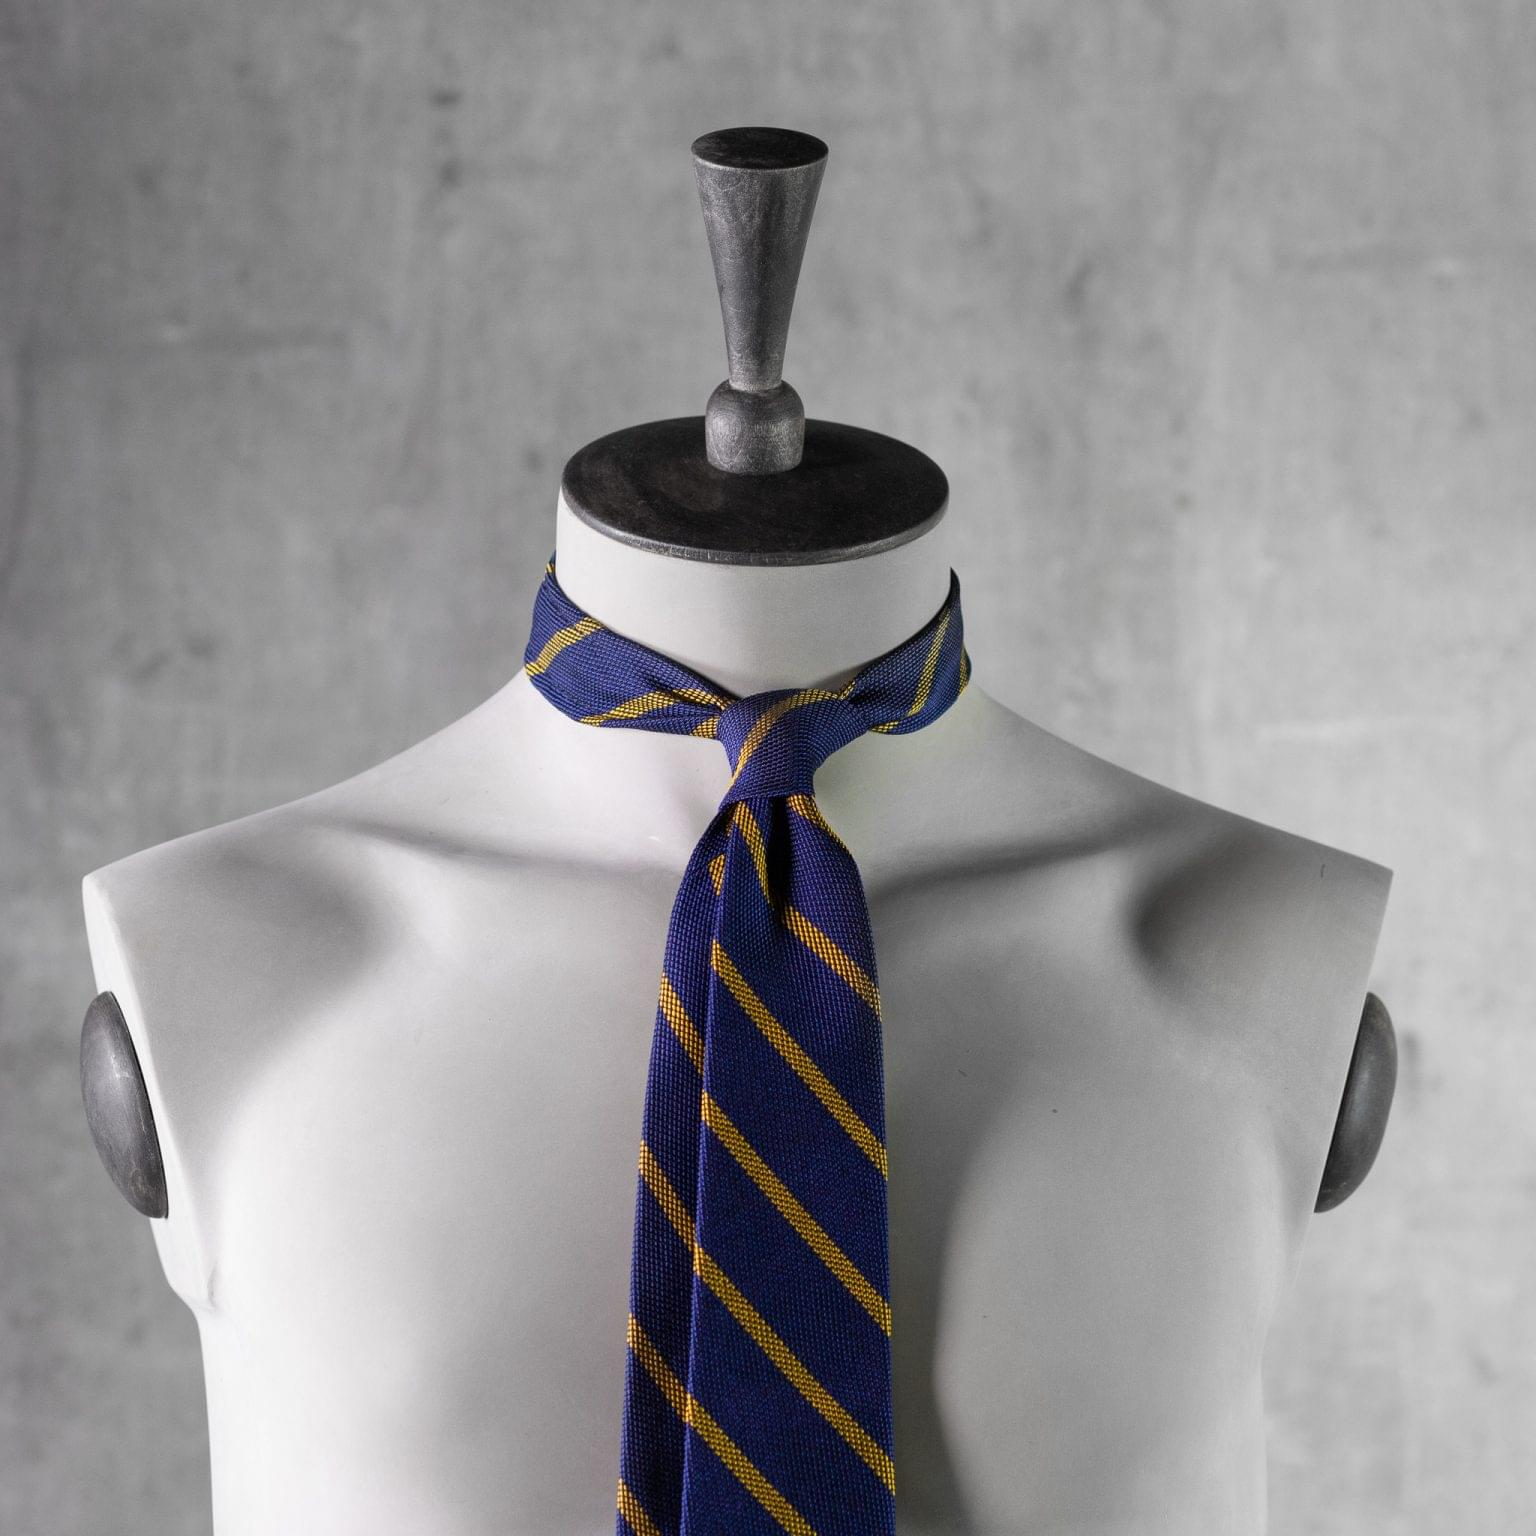 GRENADINE-0444-Tie-Initials-Corbata-Iniciales-The-Seelk-3